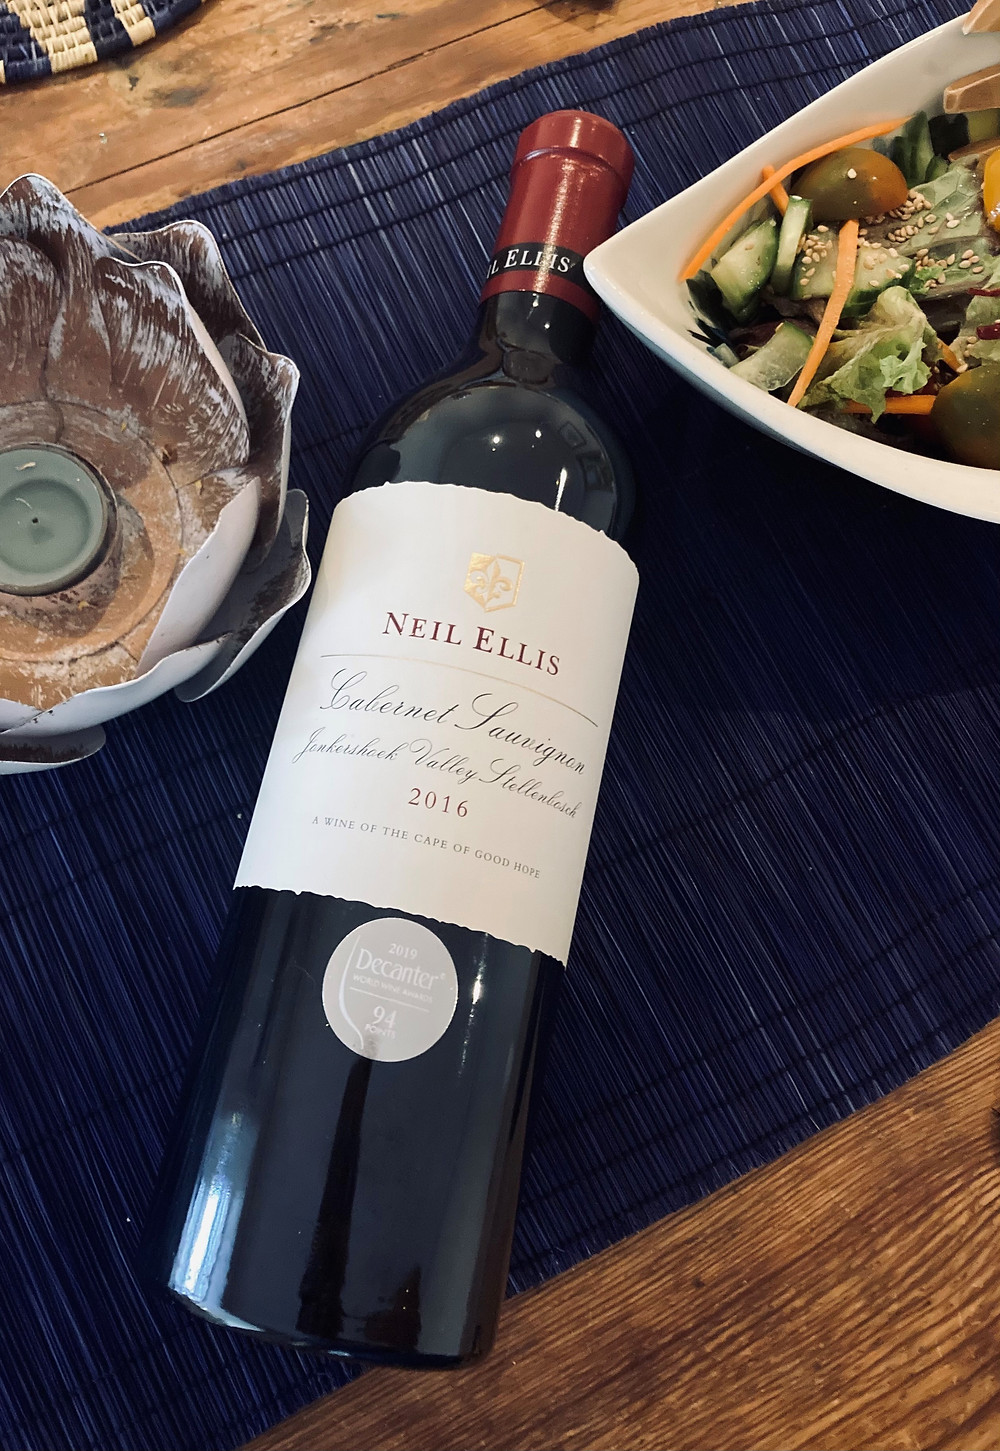 Neil Ellis Jonkershoek Velley Cabernet sauvignon blanc wine n dinner table